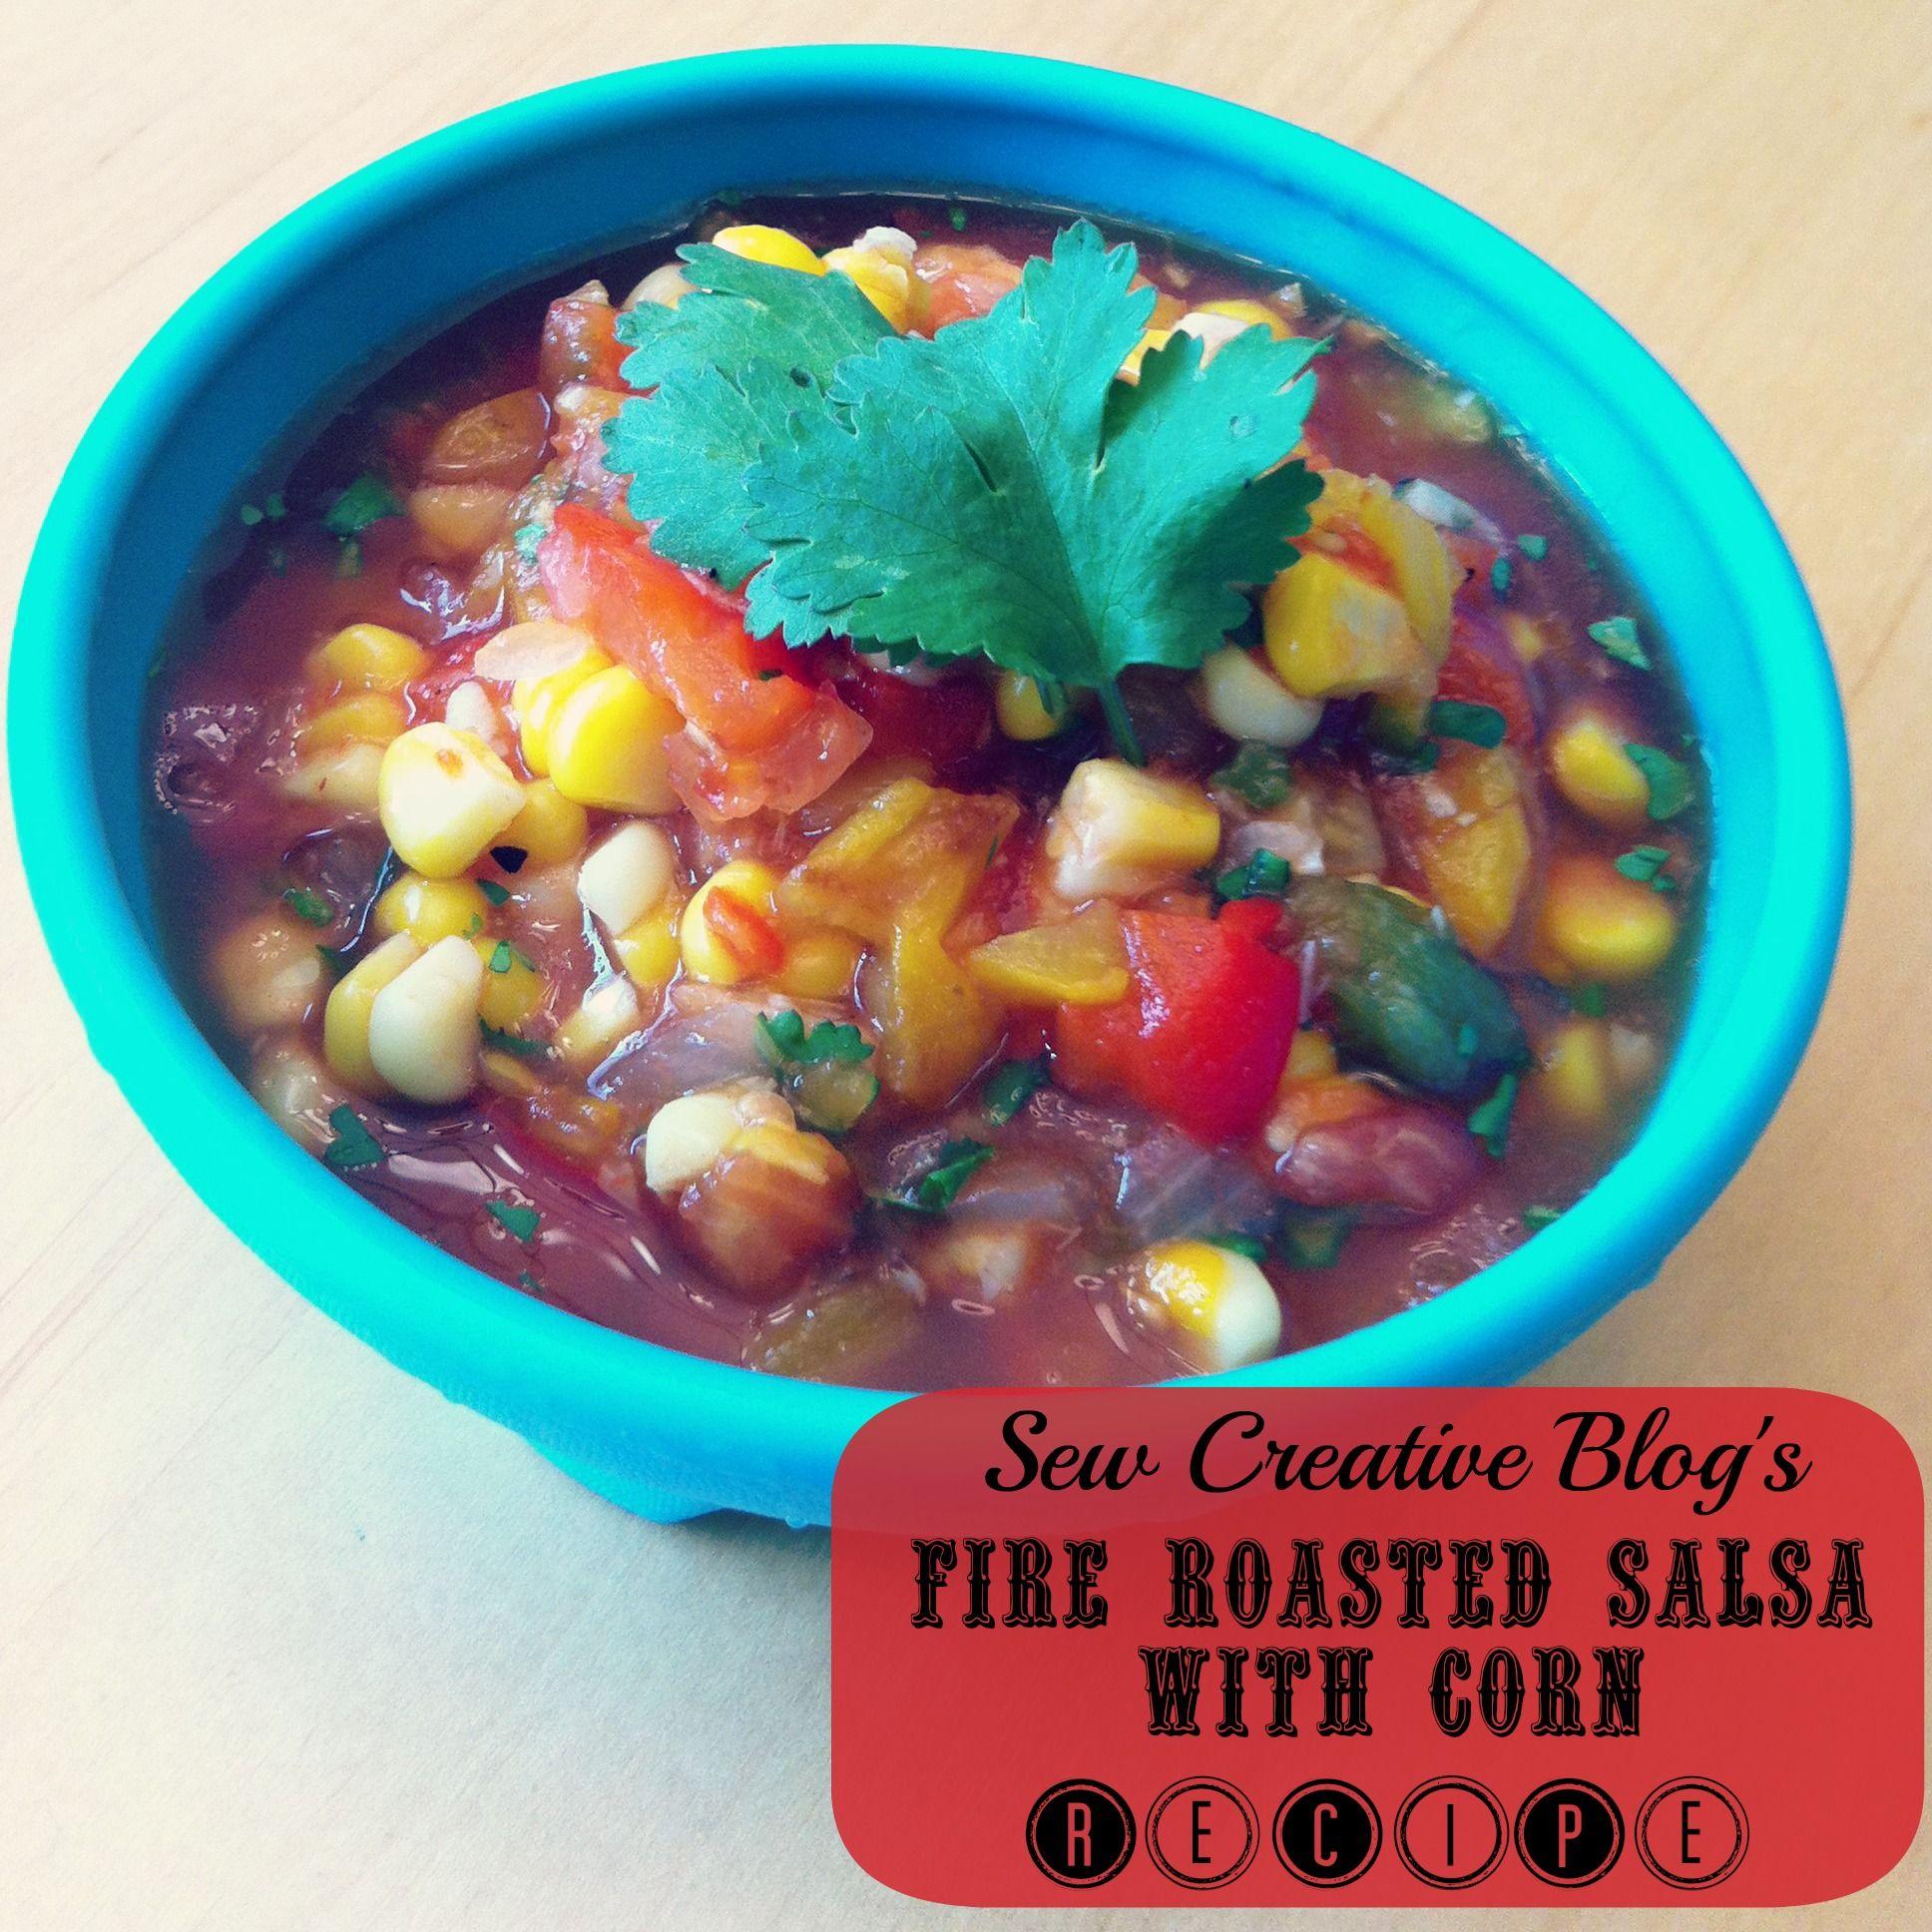 Fire Roasted Salsa With Corn Recipe | snacks | Pinterest